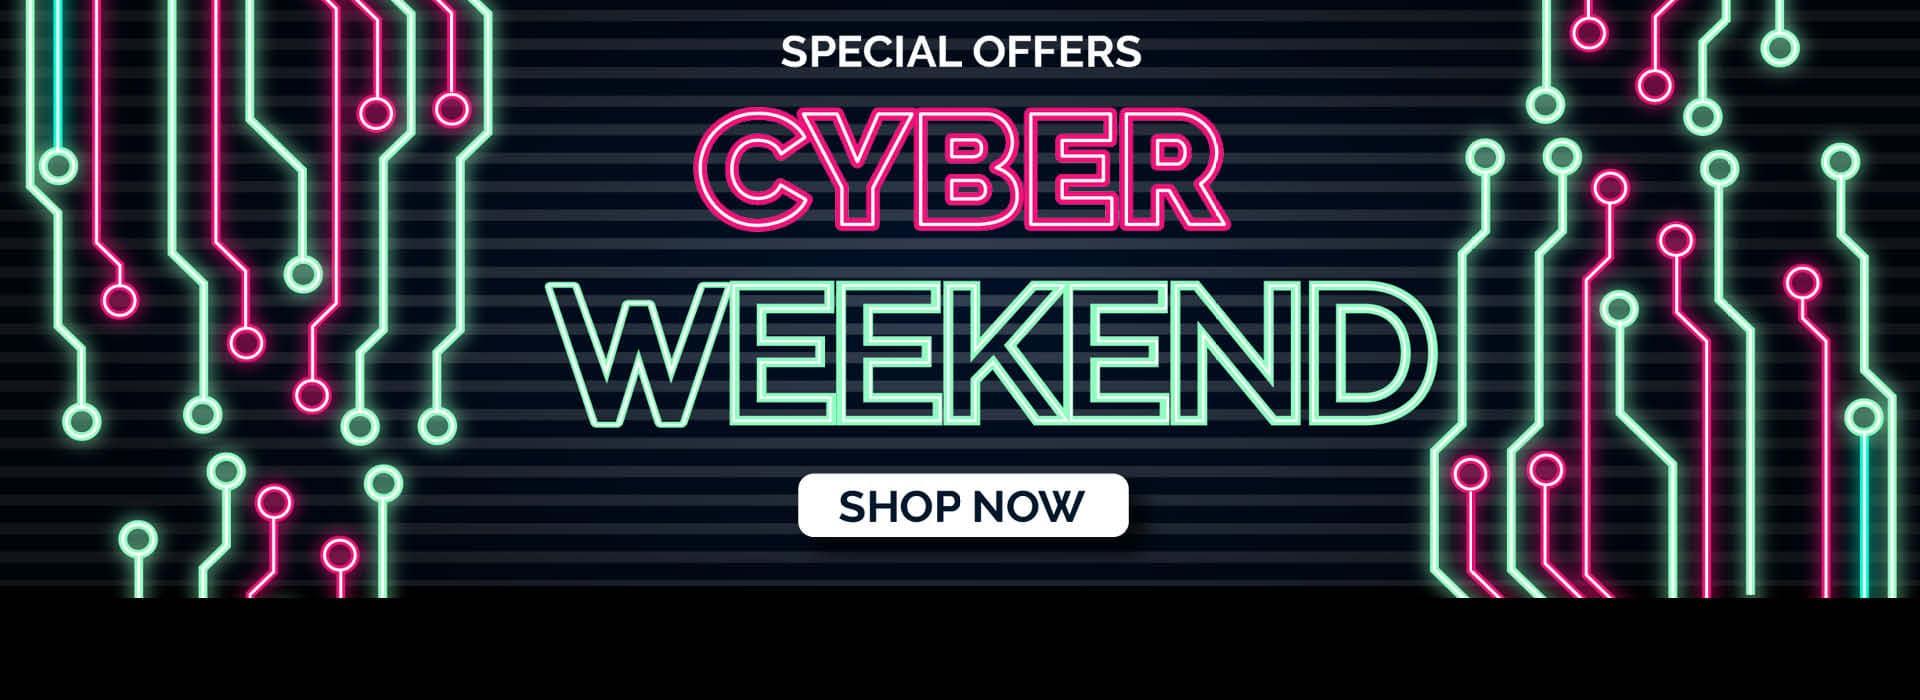 Cyber_Weekend_Desktop_Banner_November2020